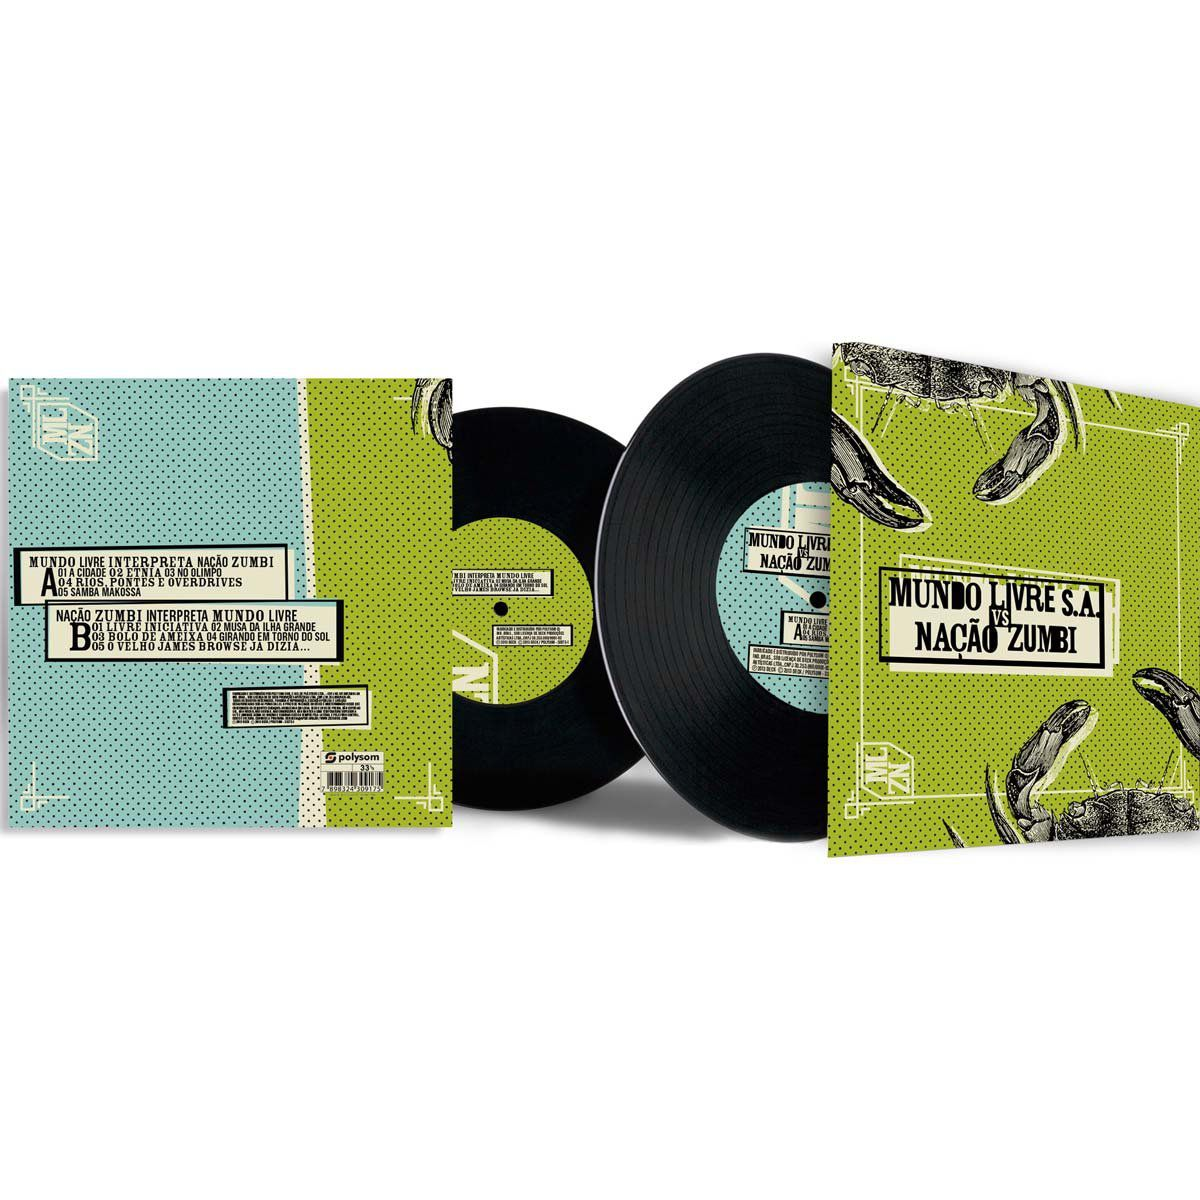 LP Mundo Livre x Nação Zumbi  - bandUP Store Marketplace